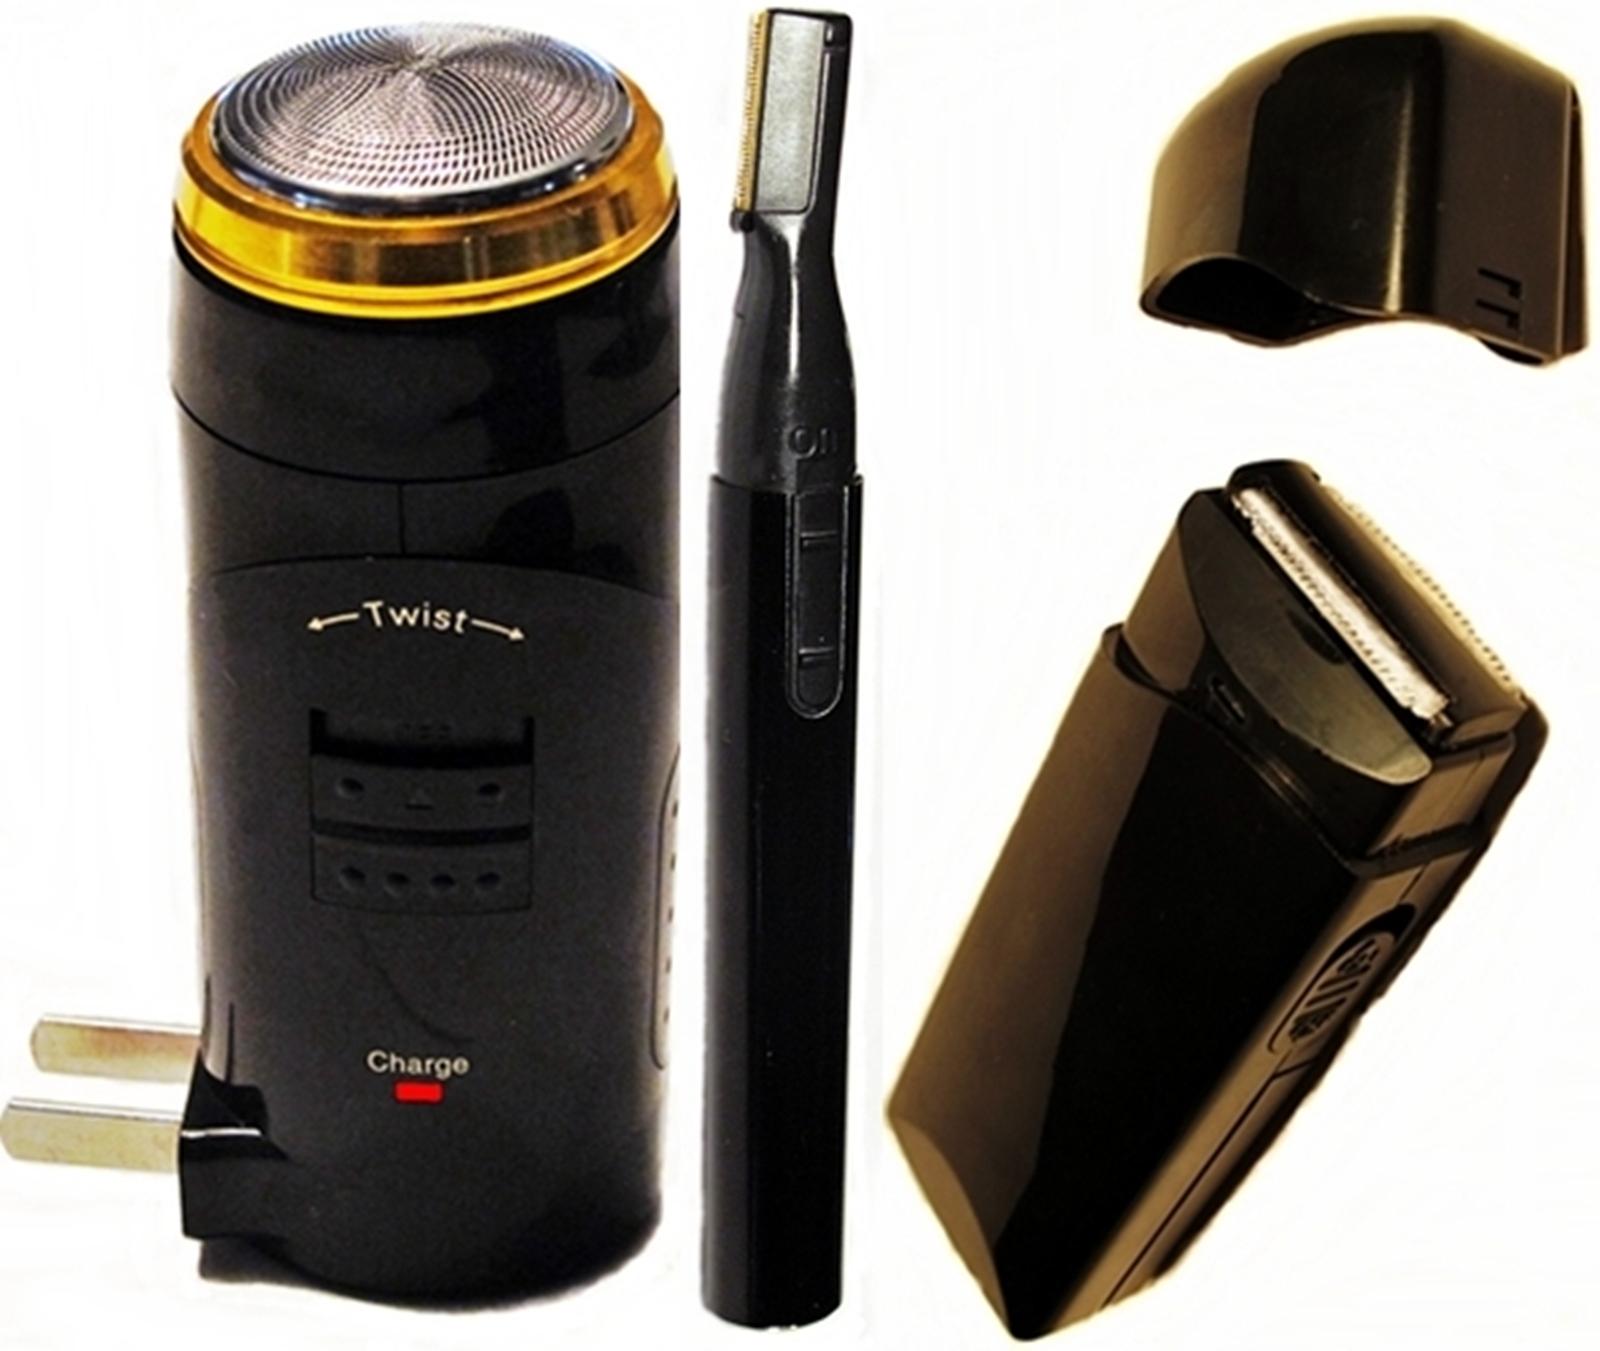 Hair eRazor Fuzion Pubic Shaver Trimmer recommendations